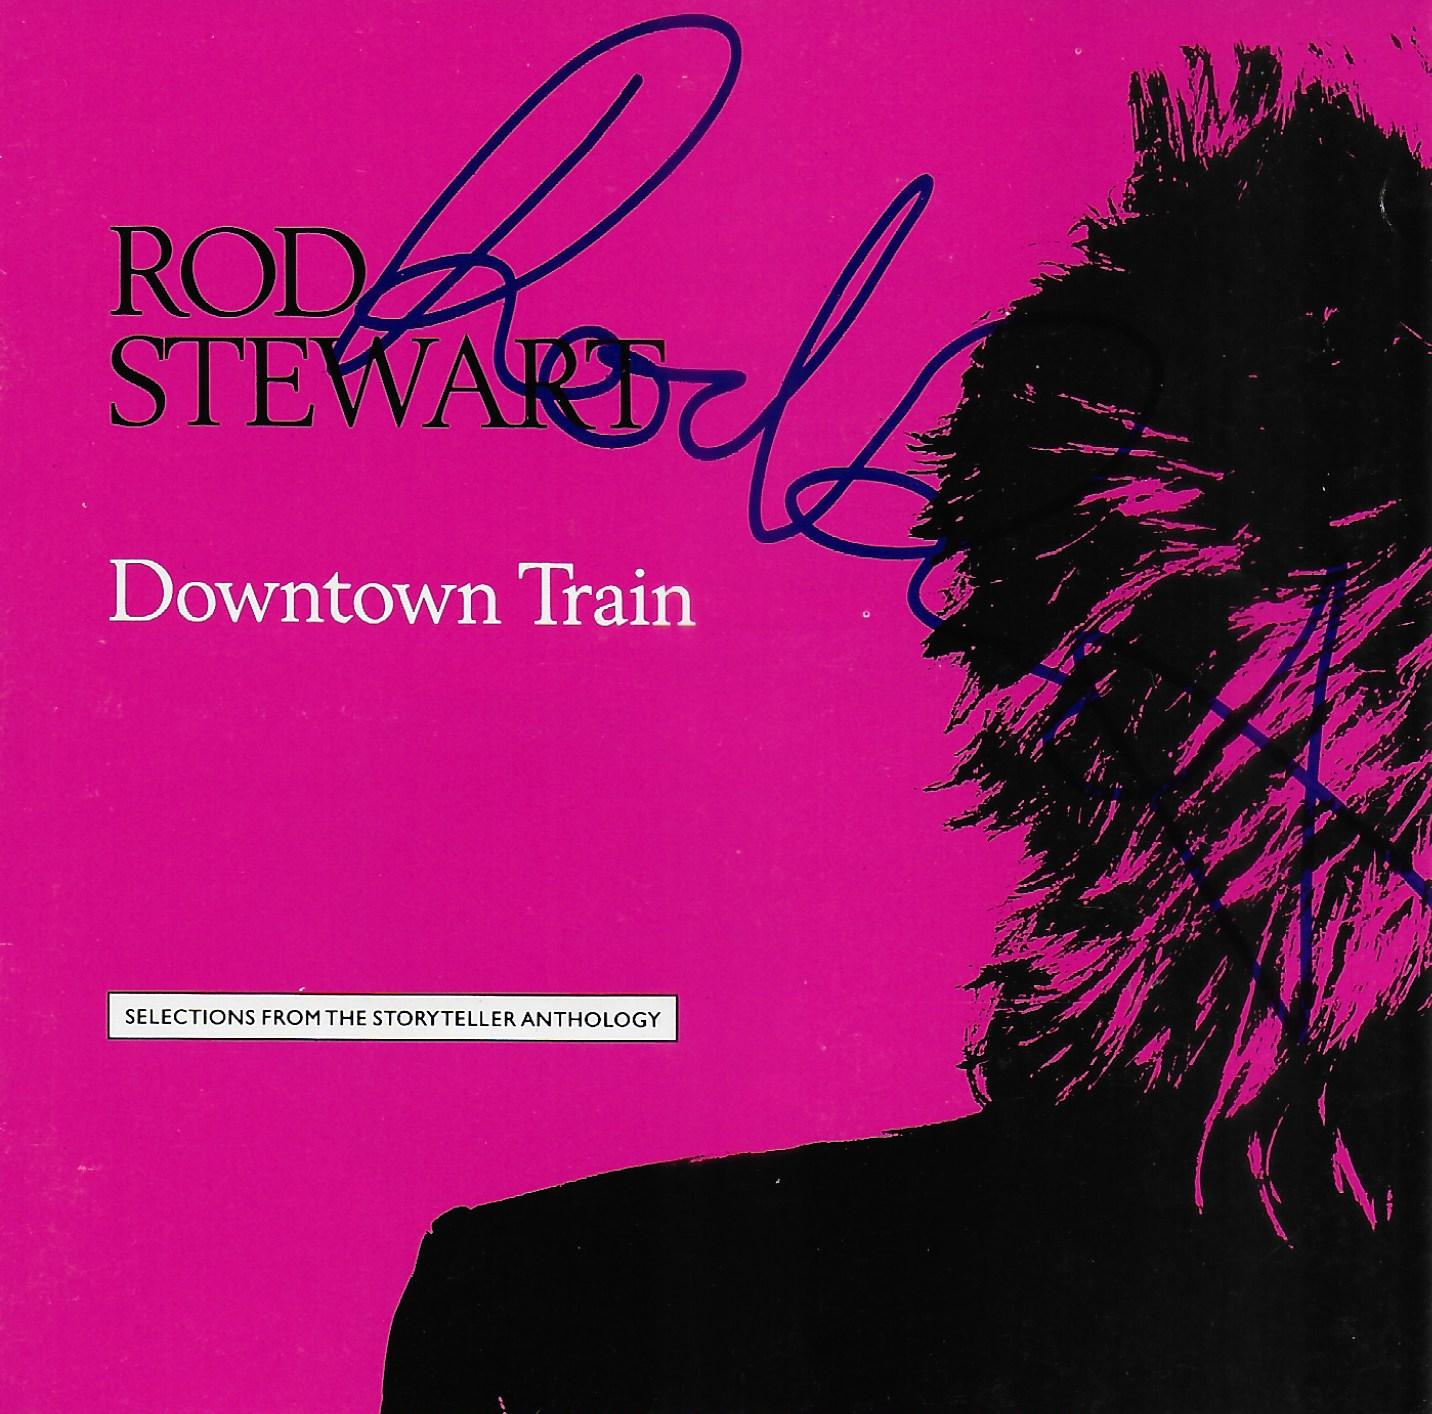 Tour Books - Rod Stewart World Tour 1983-84